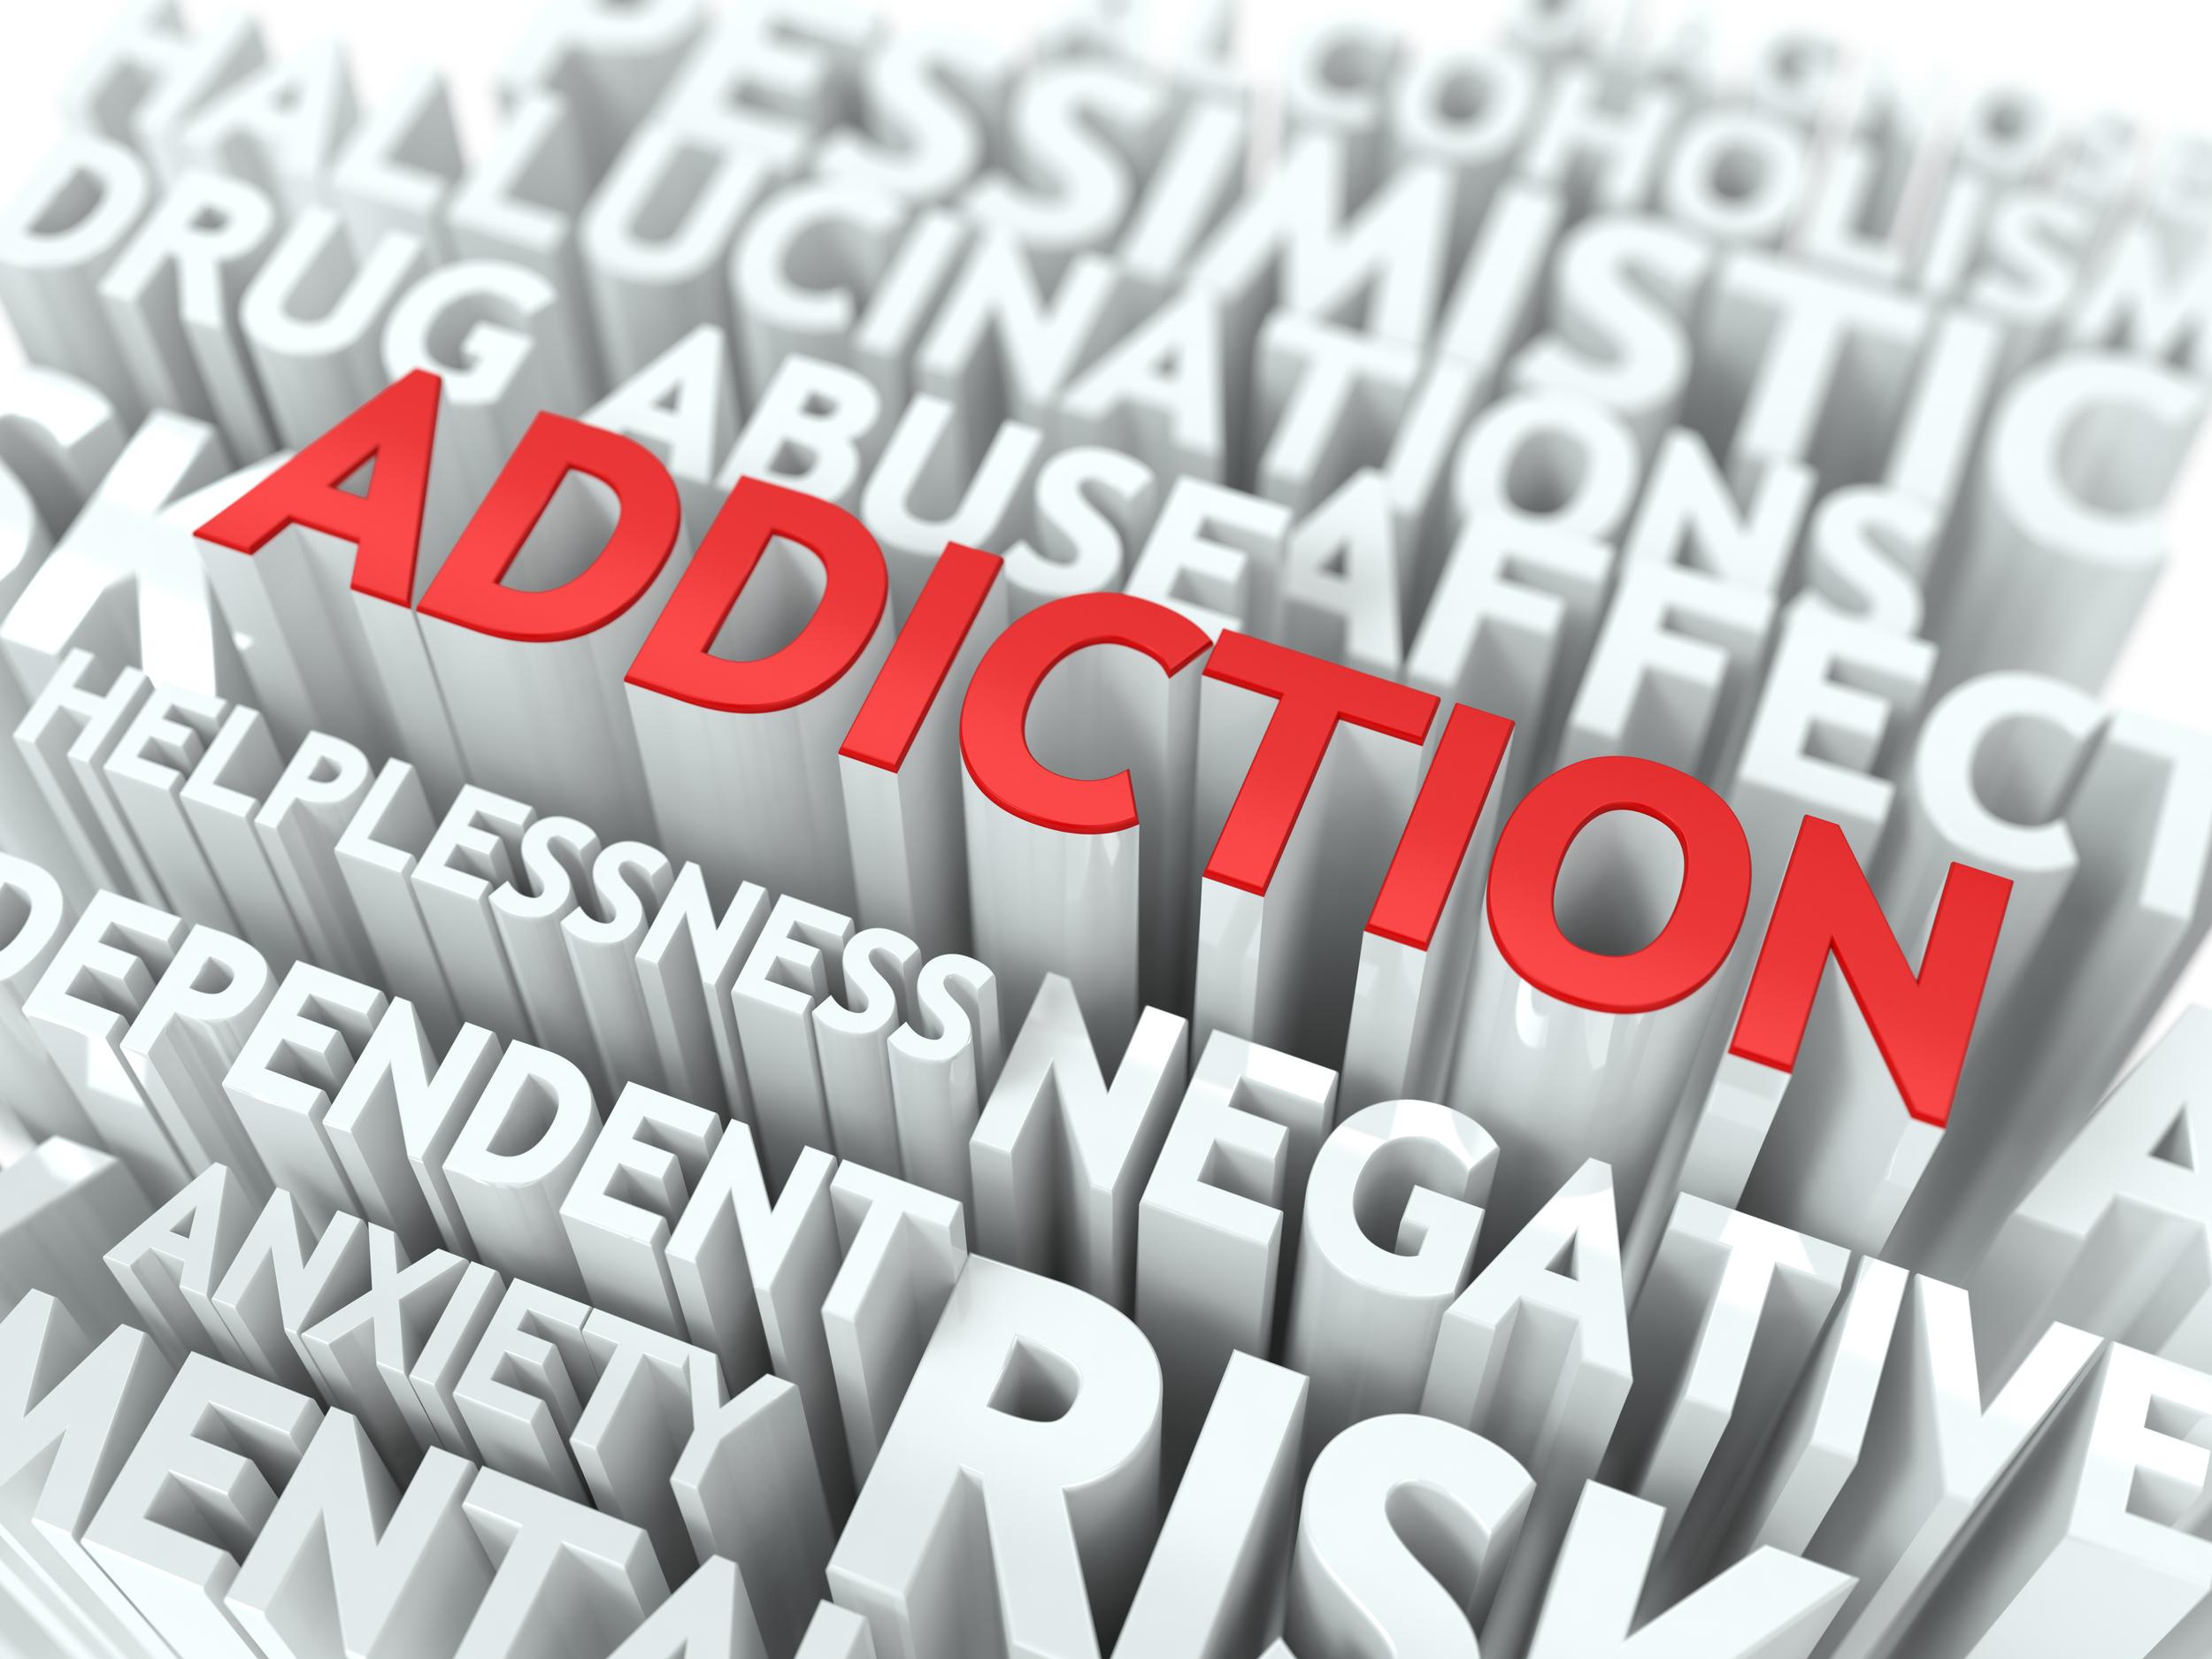 substance addiction